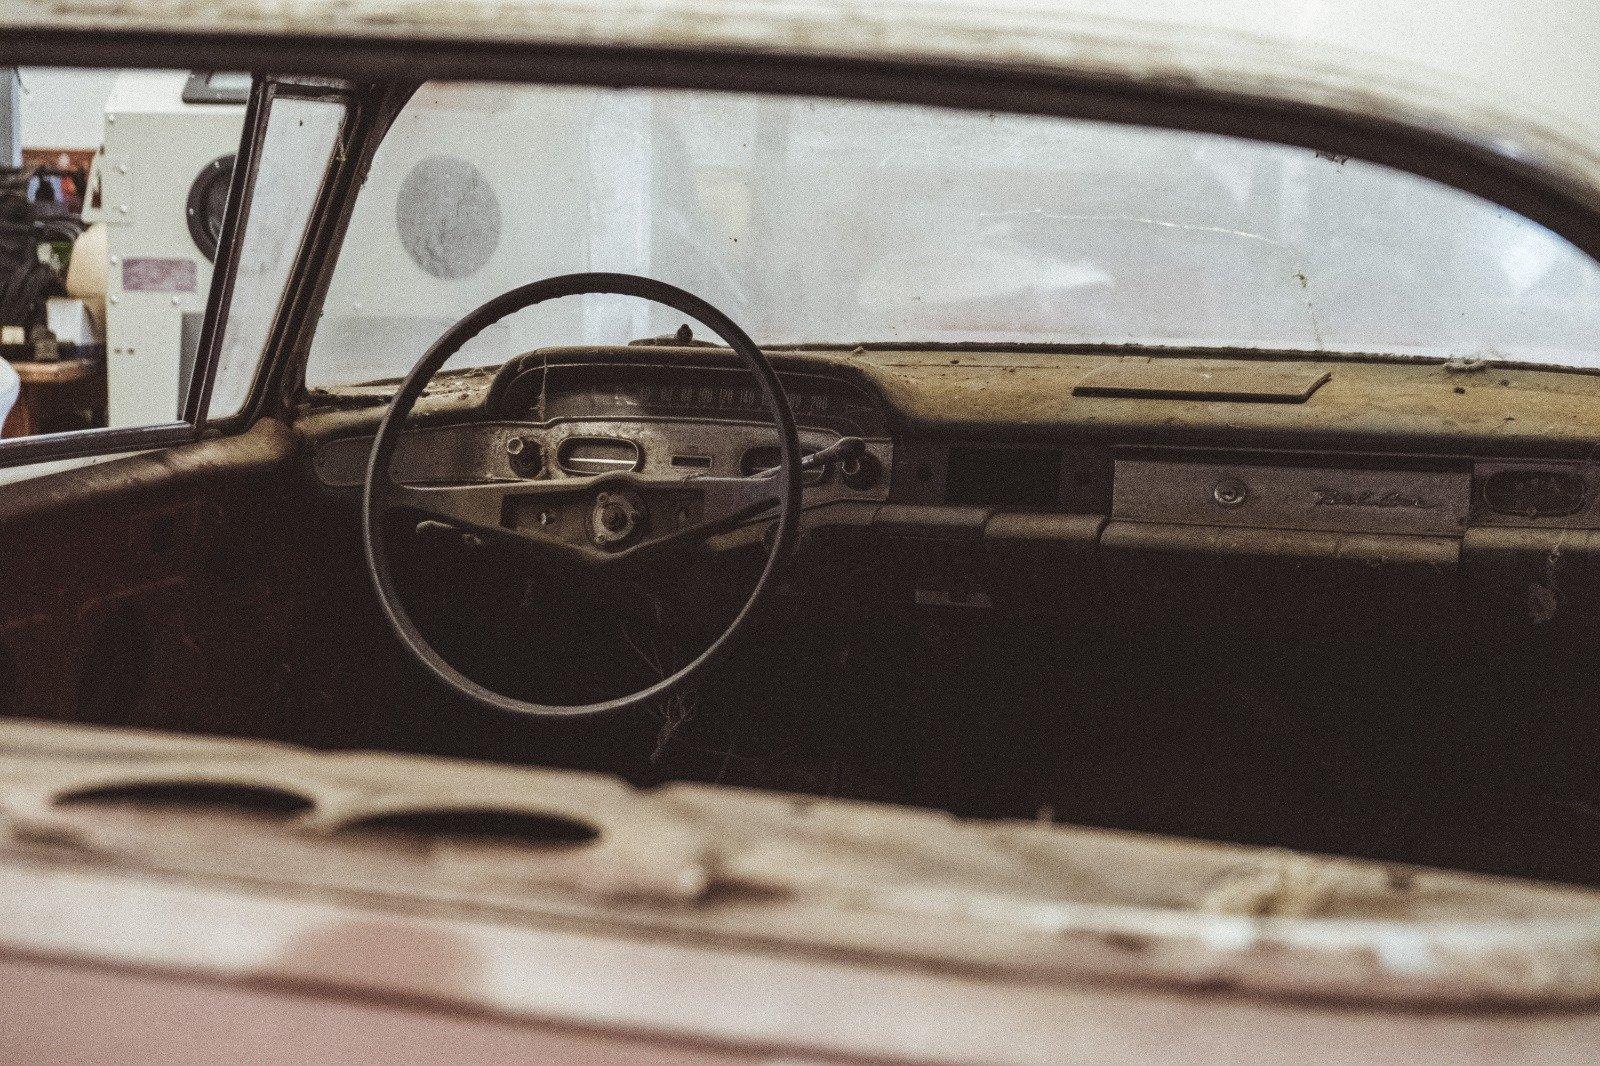 1958 Bel Air 2 door hardtop Coupe For Sale (picture 4 of 6)